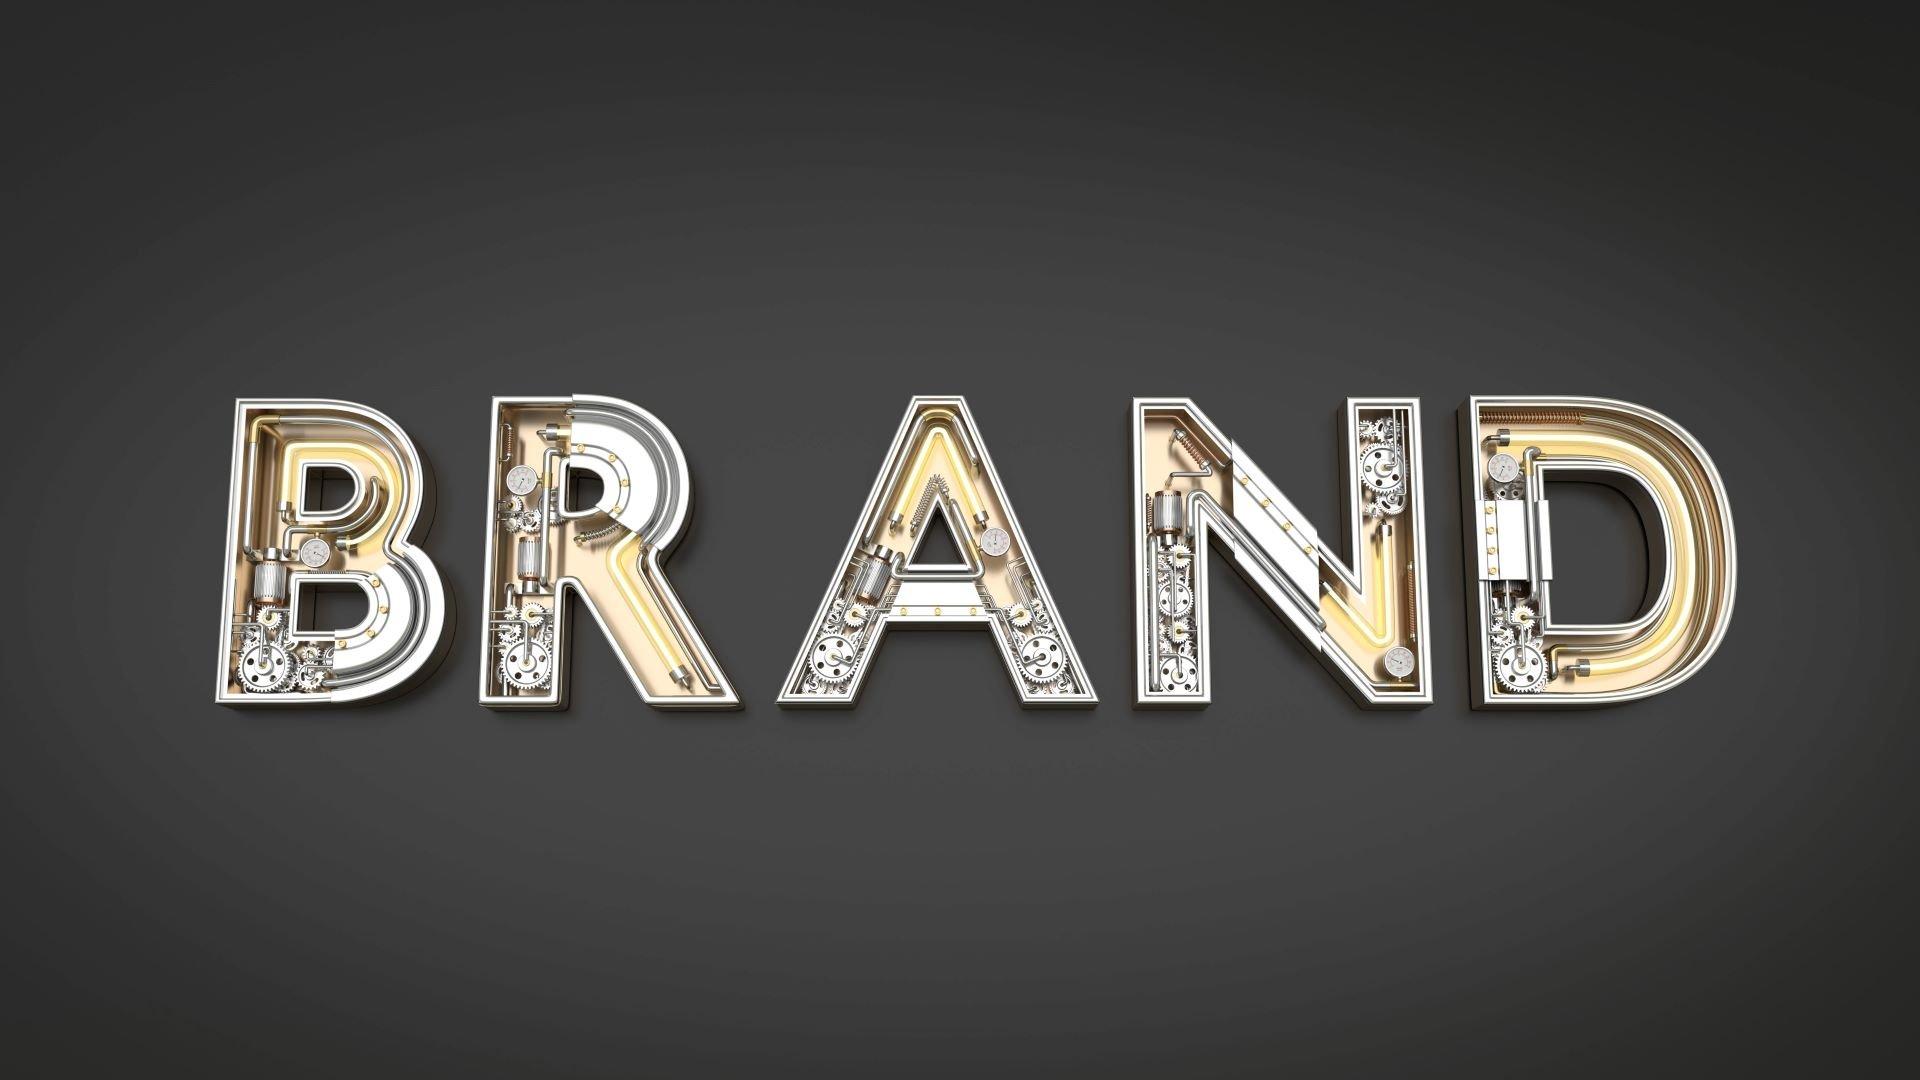 Artistic rendering of the inner mechanical gears of business branding